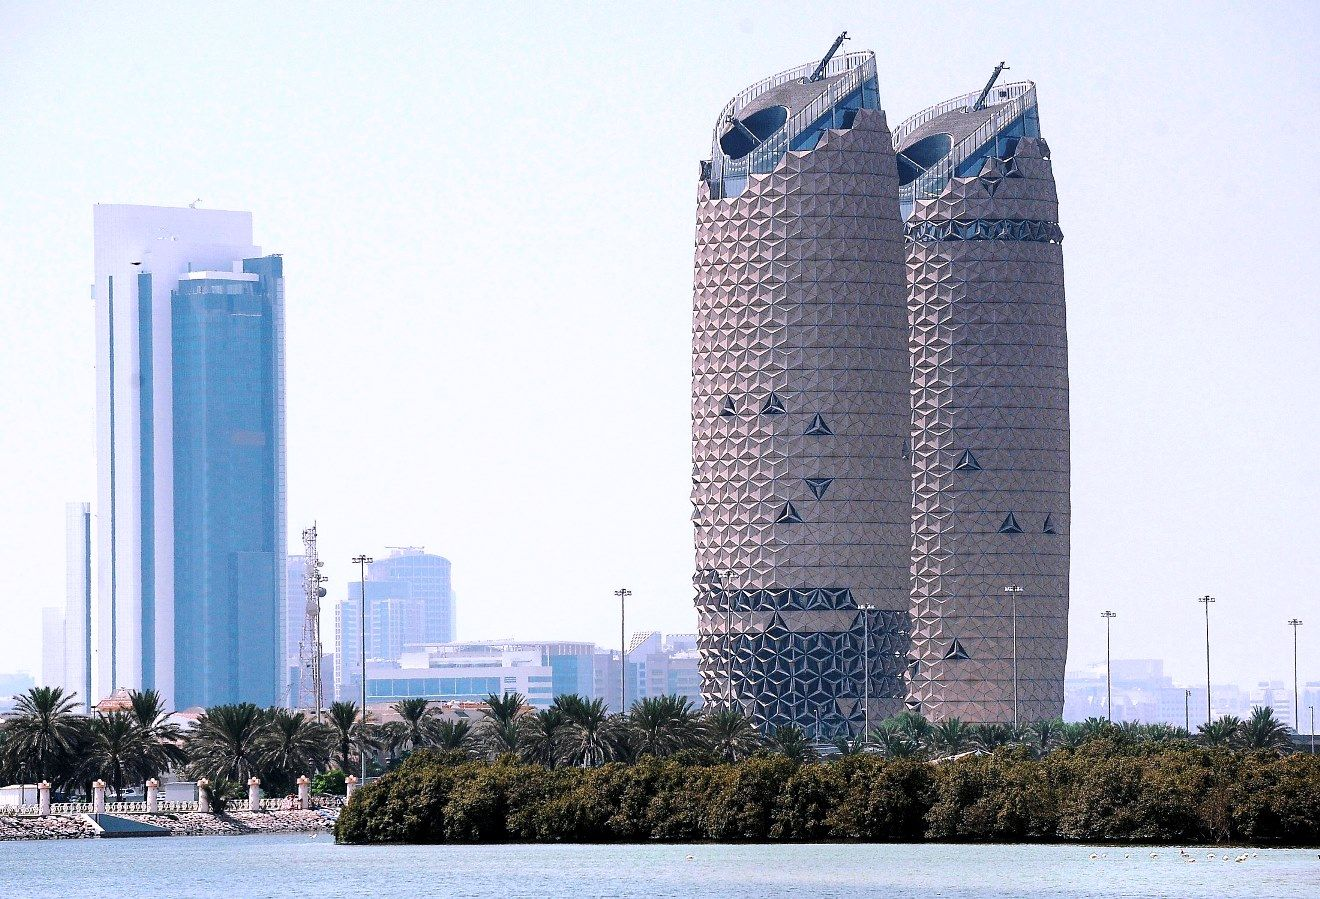 Torres Al Bahar, Abu Dhabi, Emiratos Arabes Unidos.